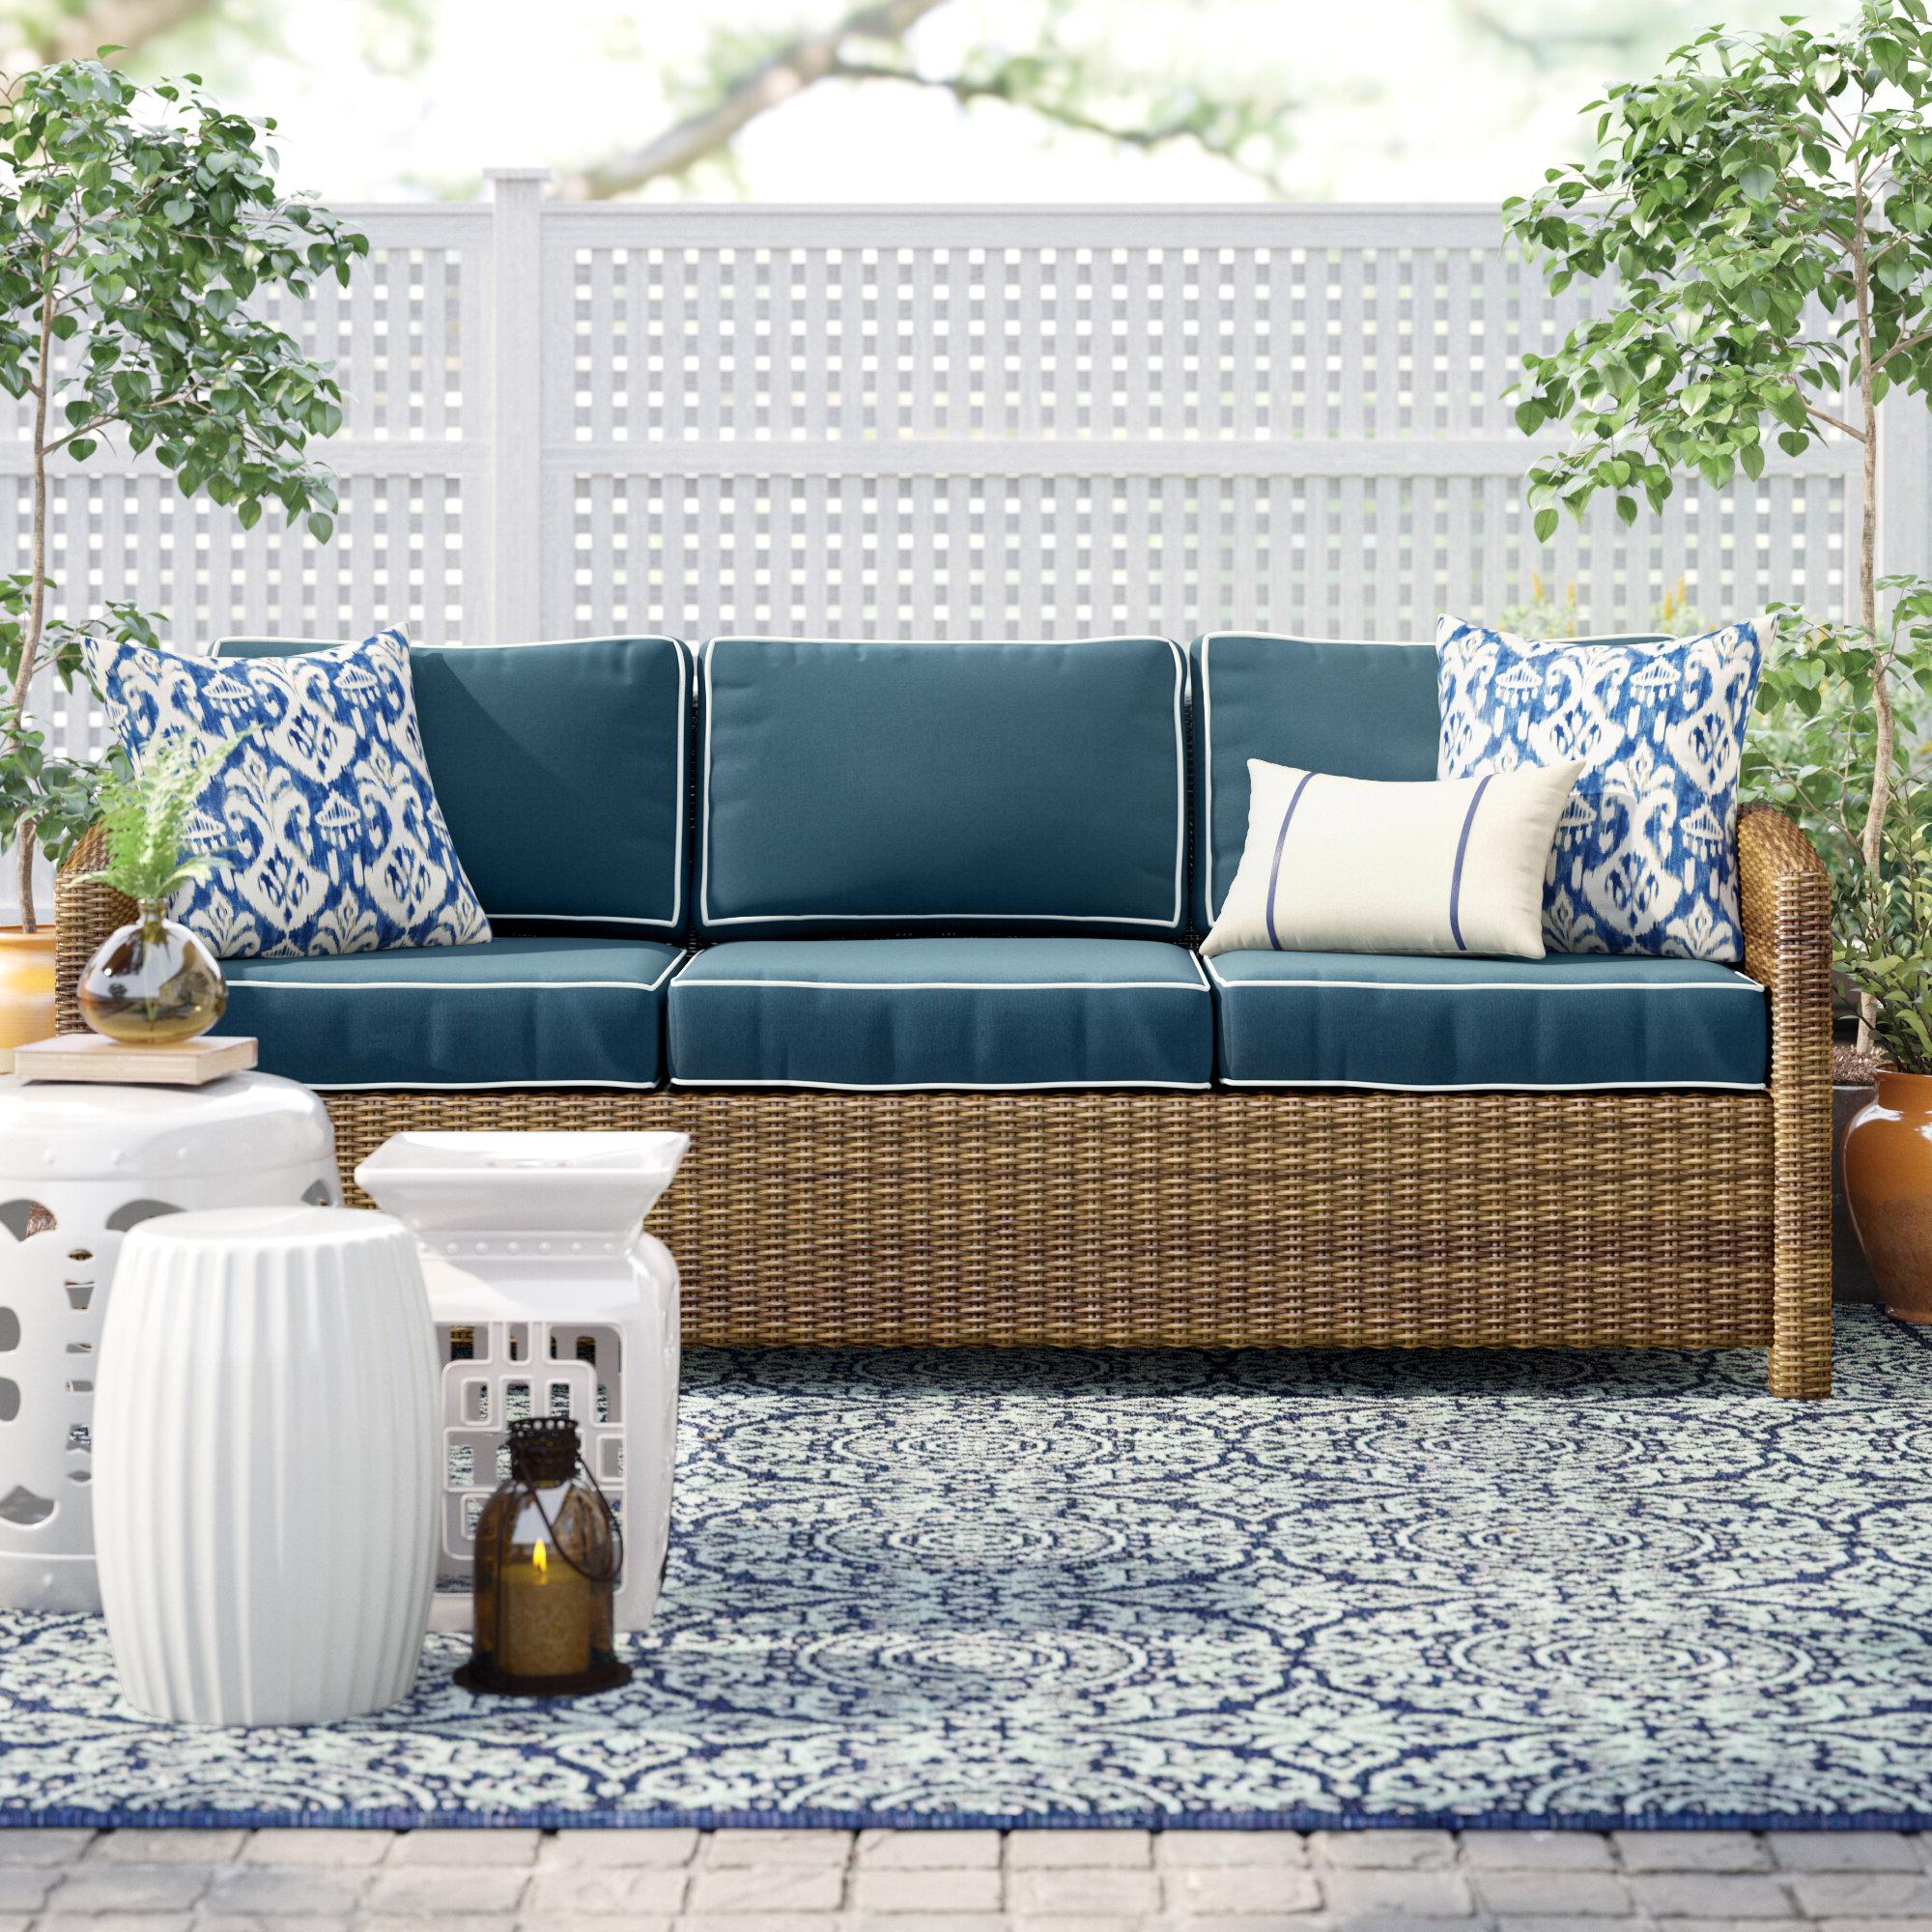 Lawson Patio Sofa With Cushions Regarding Trendy Lawson Patio Sofas With Cushions (Gallery 3 of 25)